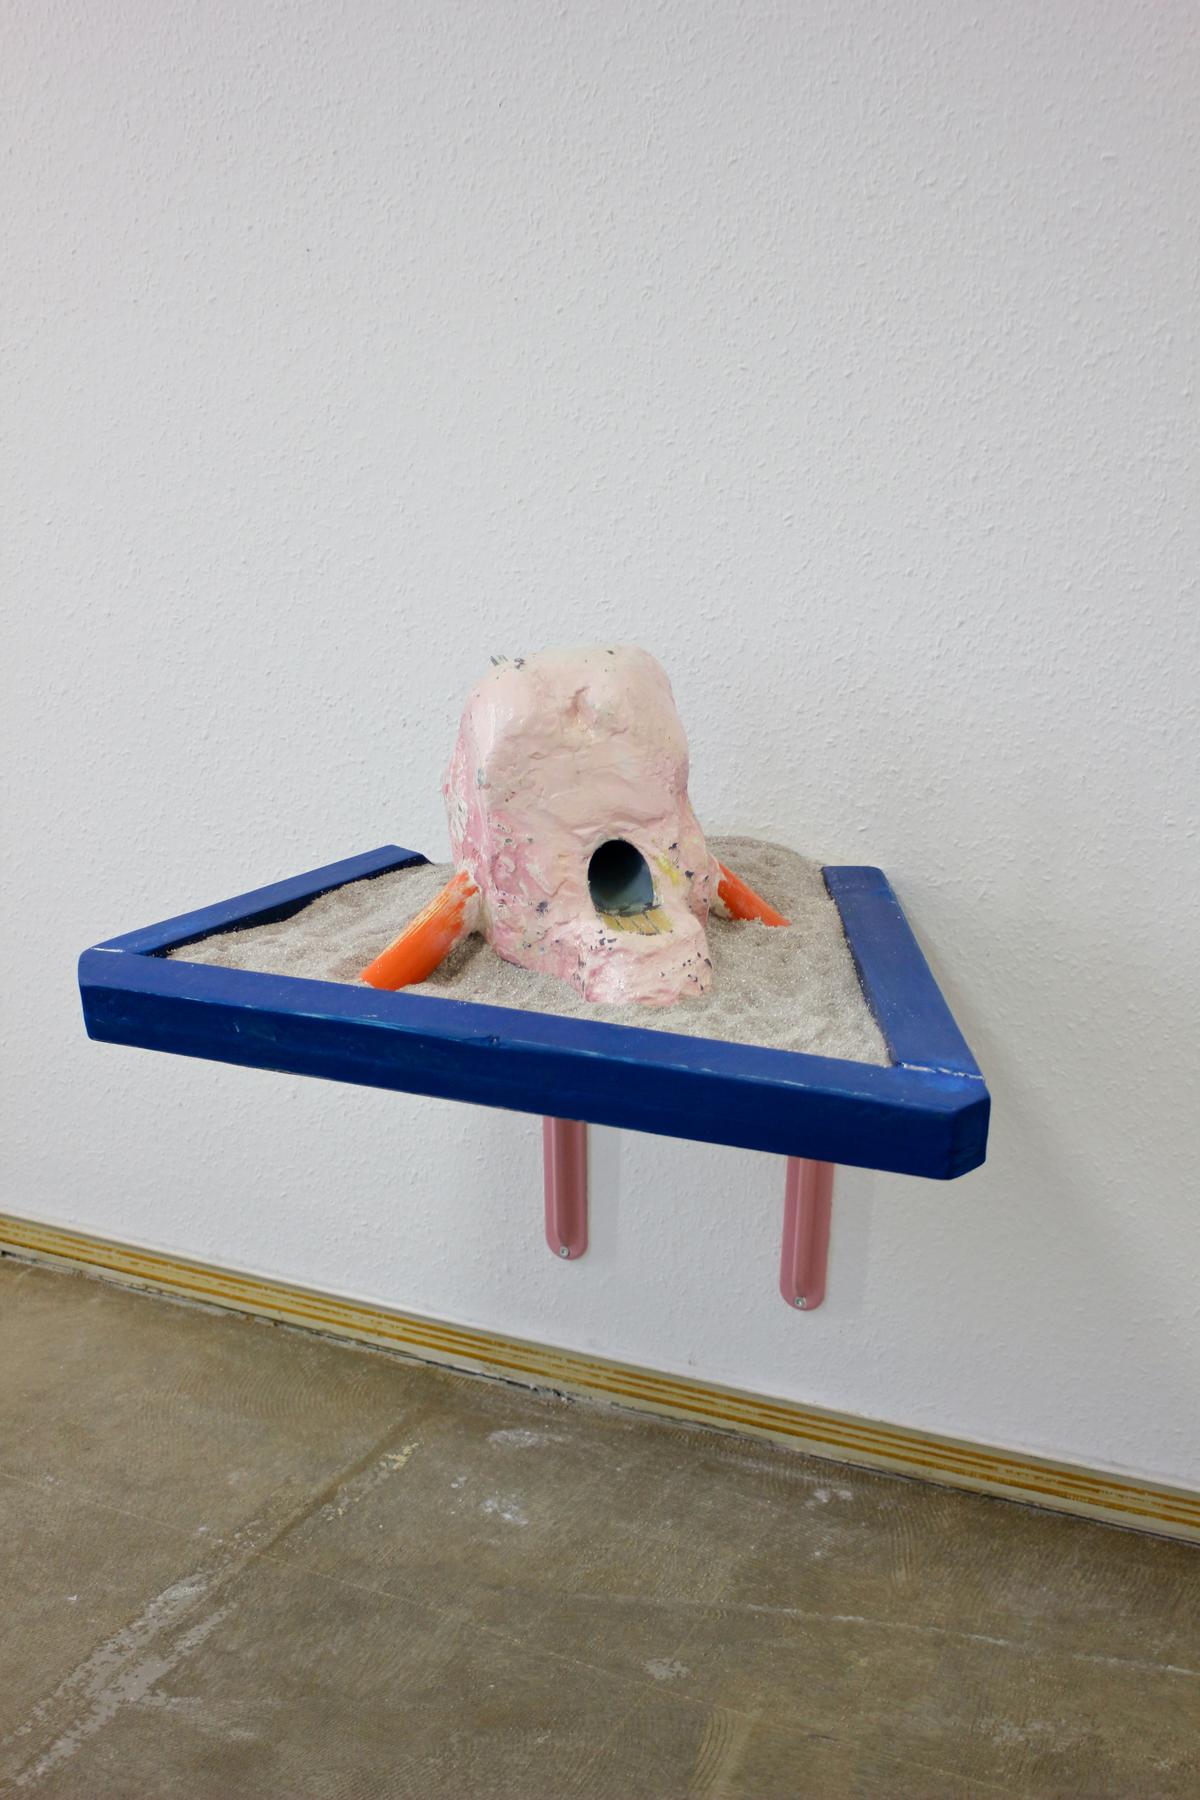 exhibition_view__Studio_LOES_Raiko_Sanchez4